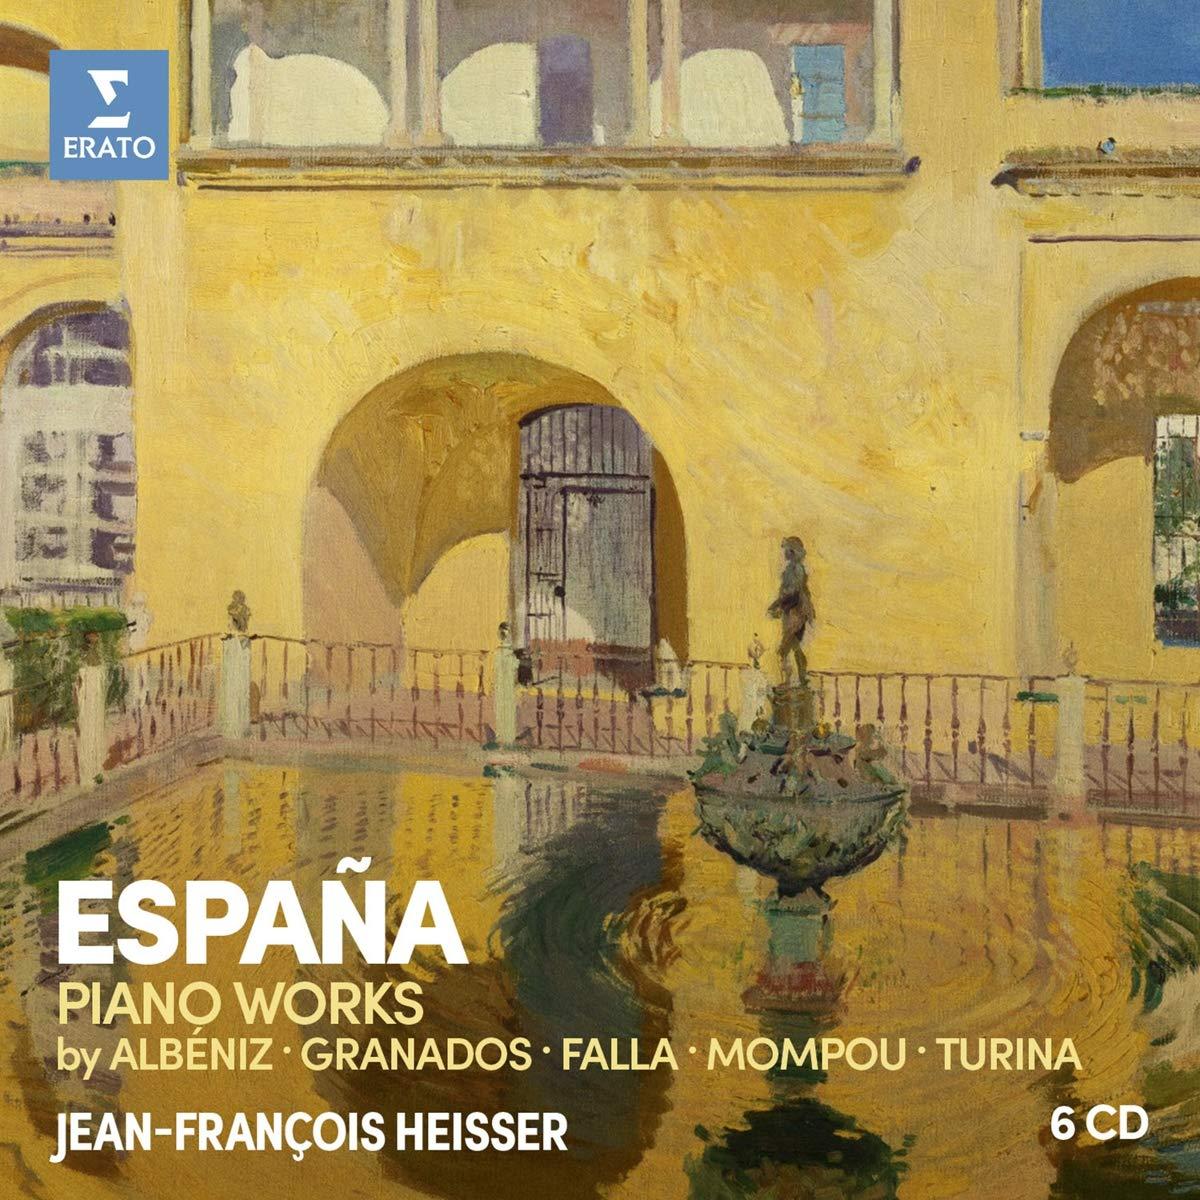 CD : Jean-Frangois Heisser - Espana: Albeniz Falla Granados Mompou Turina (6PC)